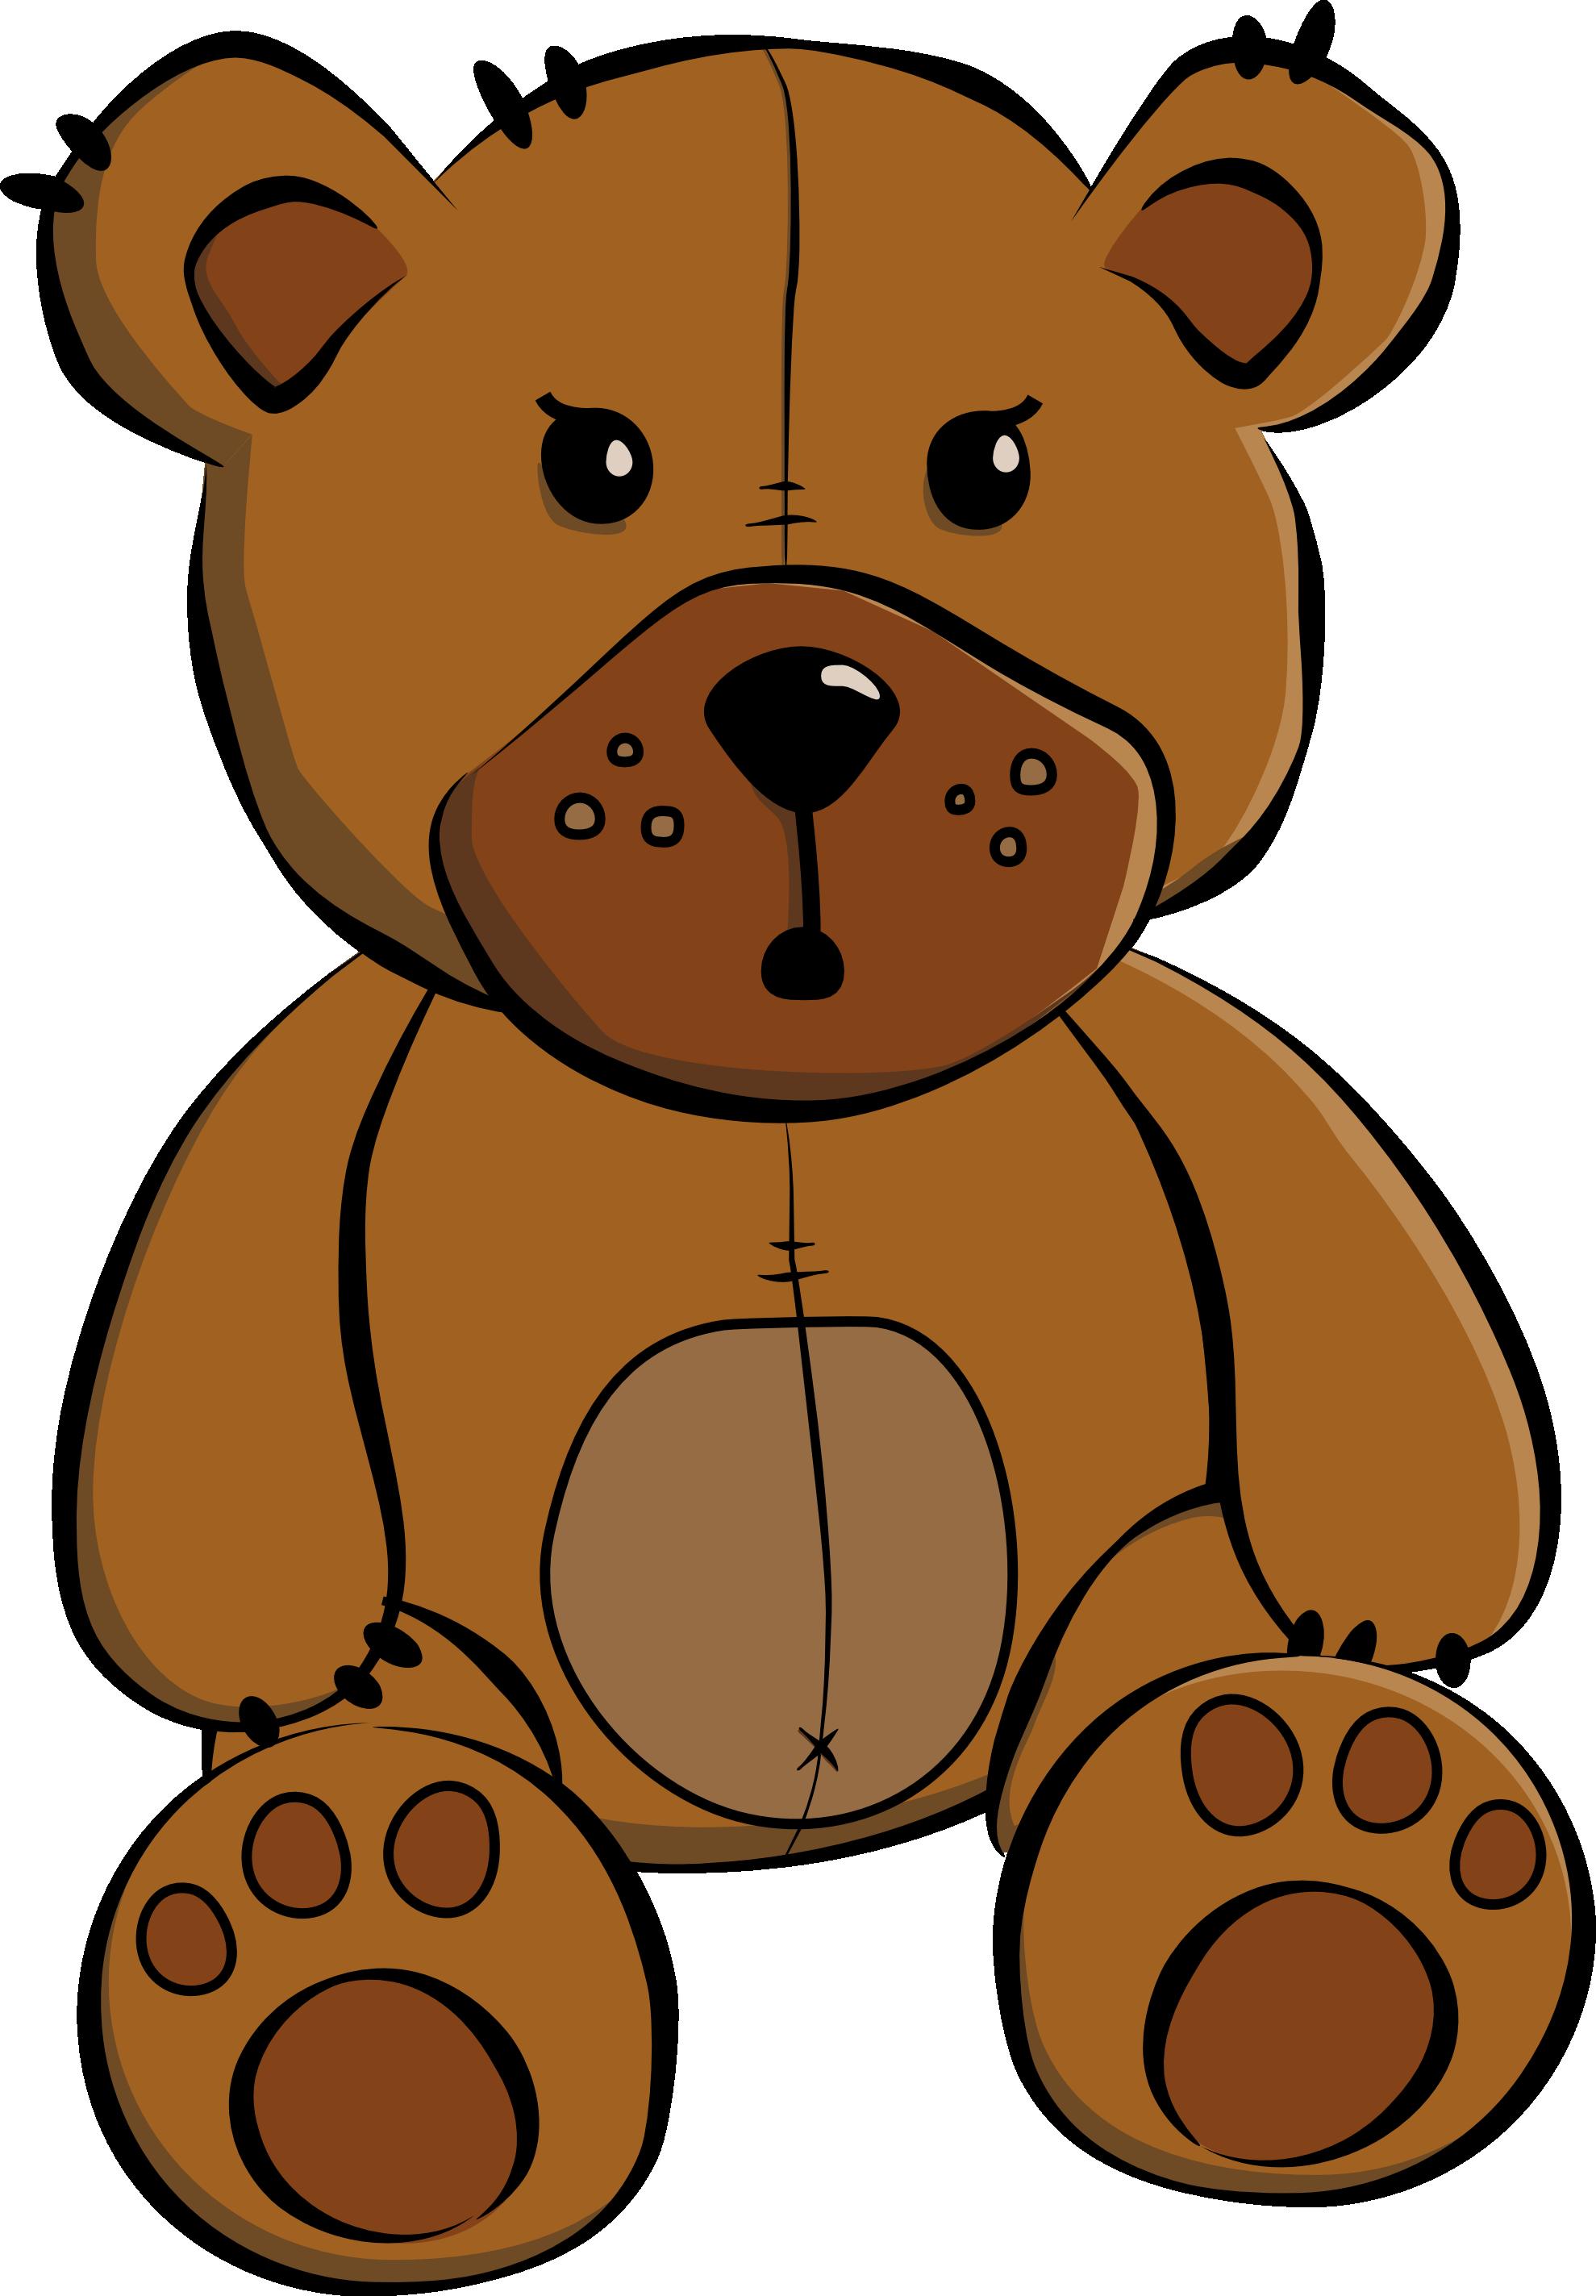 Simple Teddy Bear Drawing - ClipArt Best